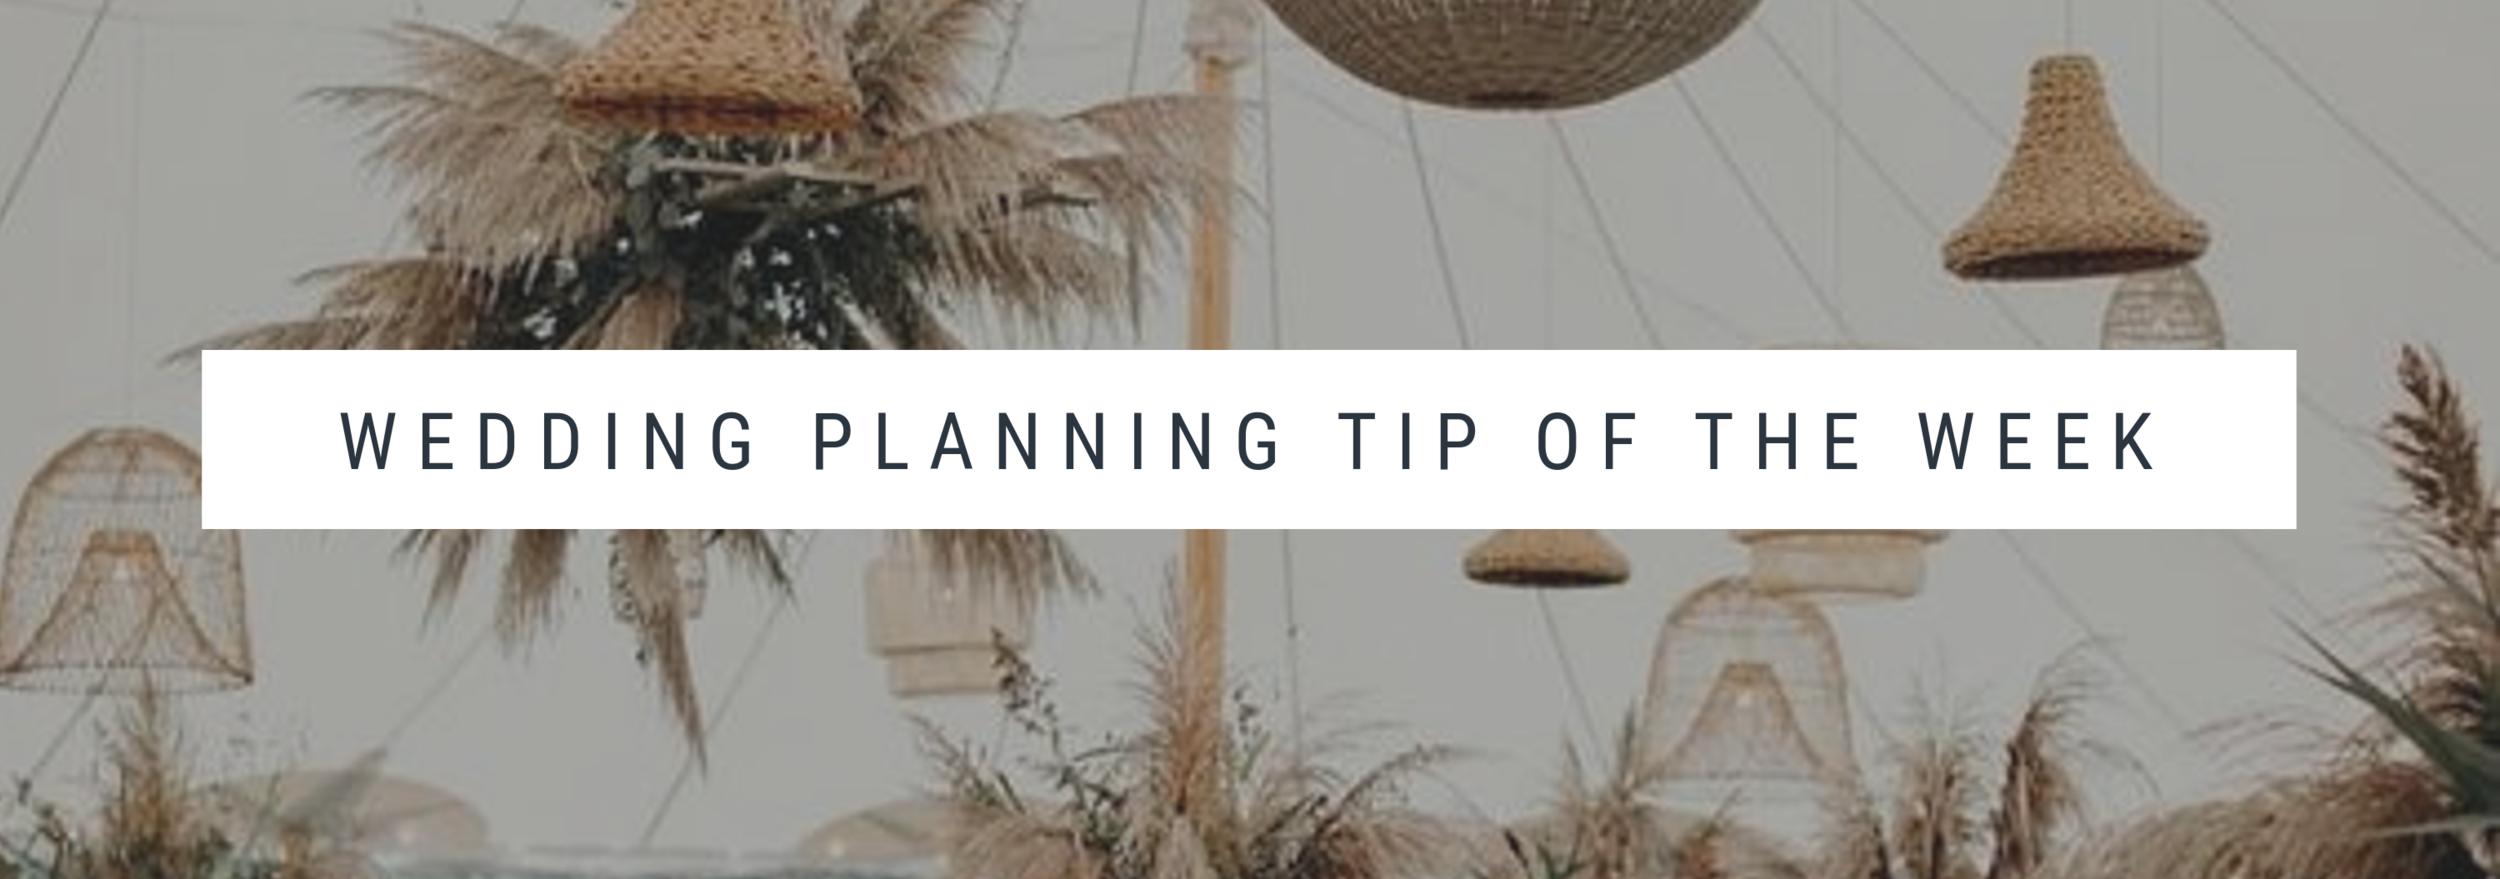 ivory-and-beau-blog-savannah-wedding-planner-wedding planning tip of the week.png